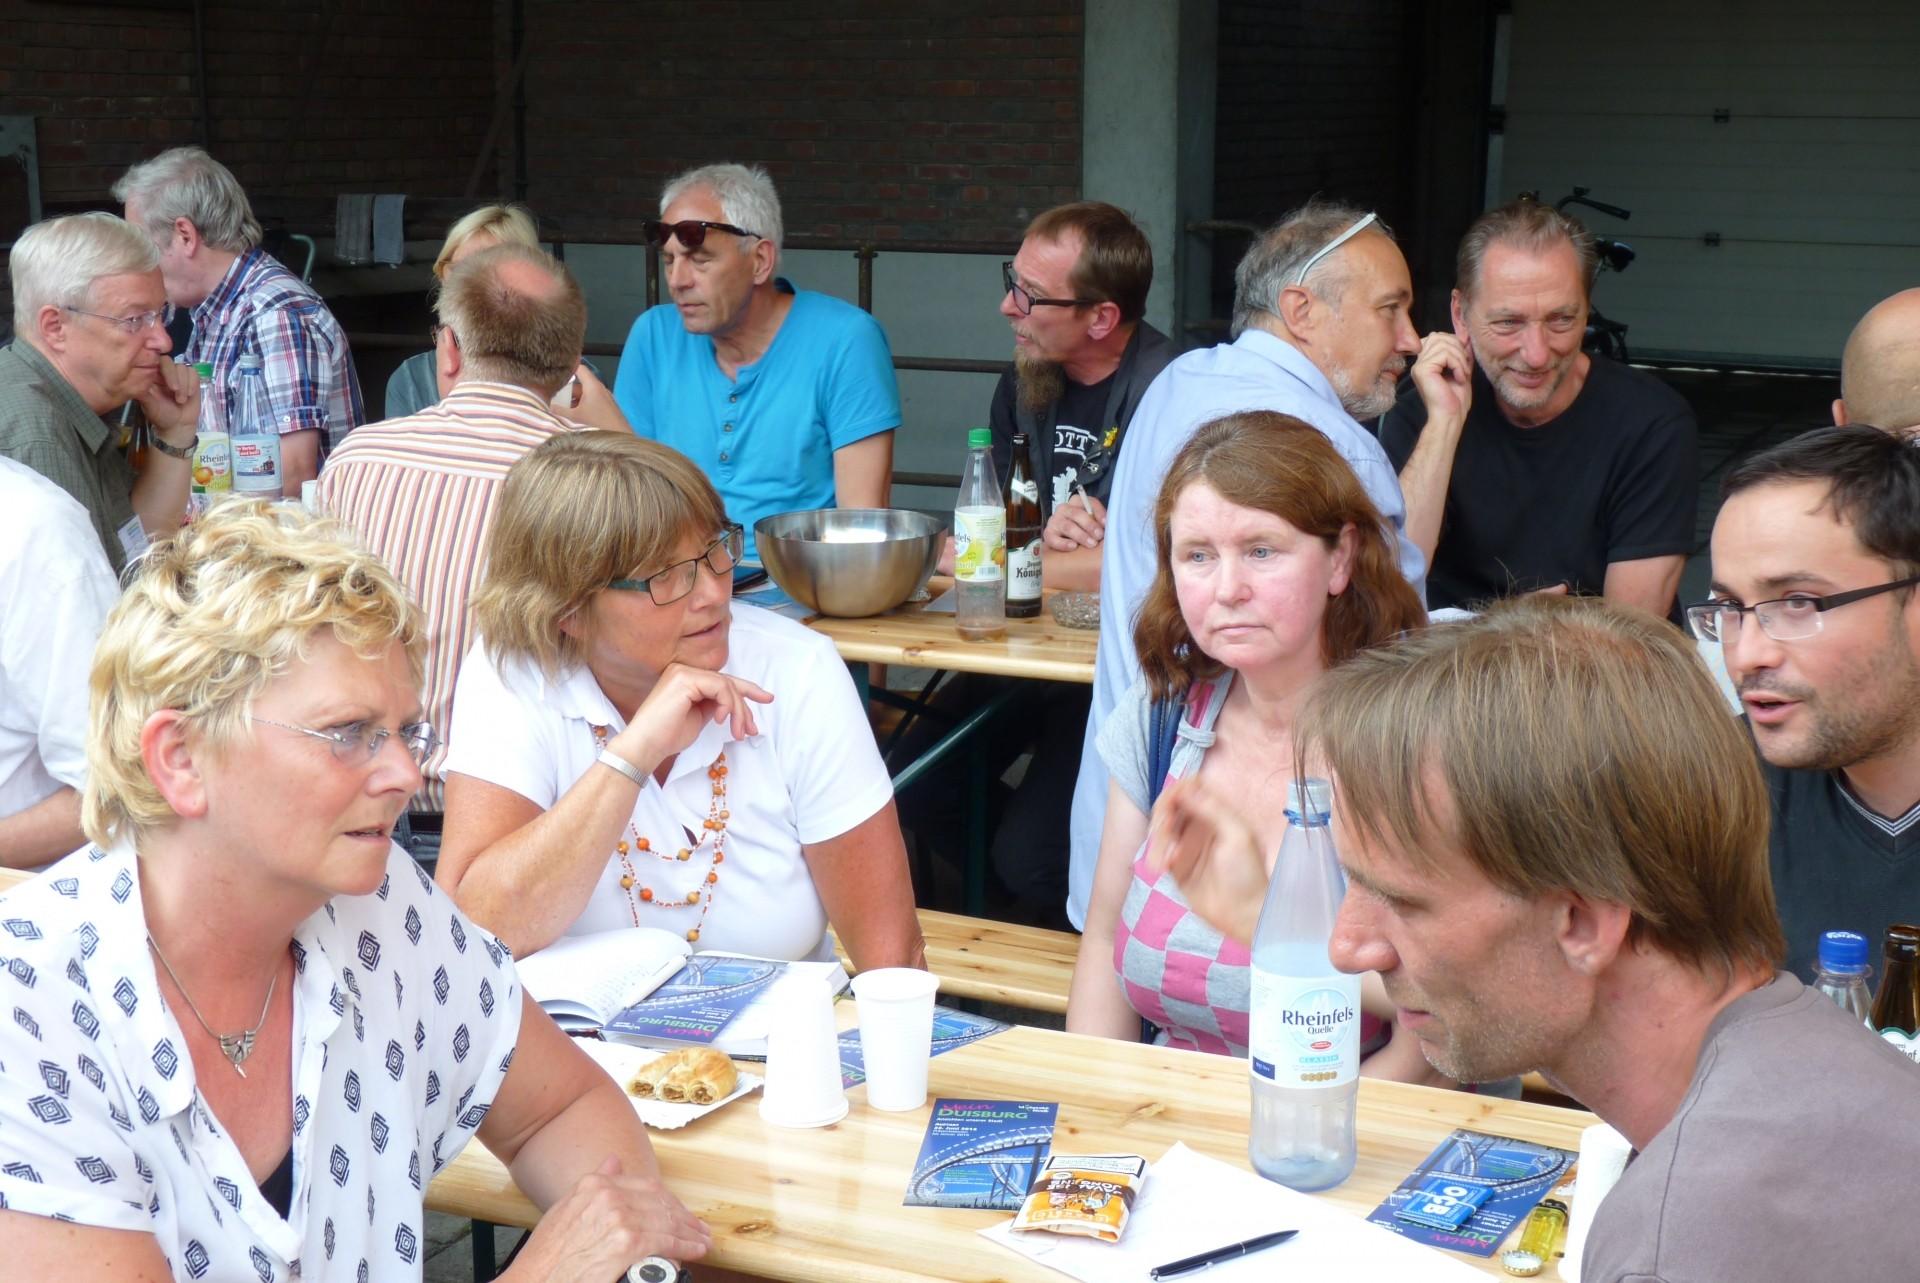 Projektstammtisch am 7. August 2014 - Foto: UNS/MUR